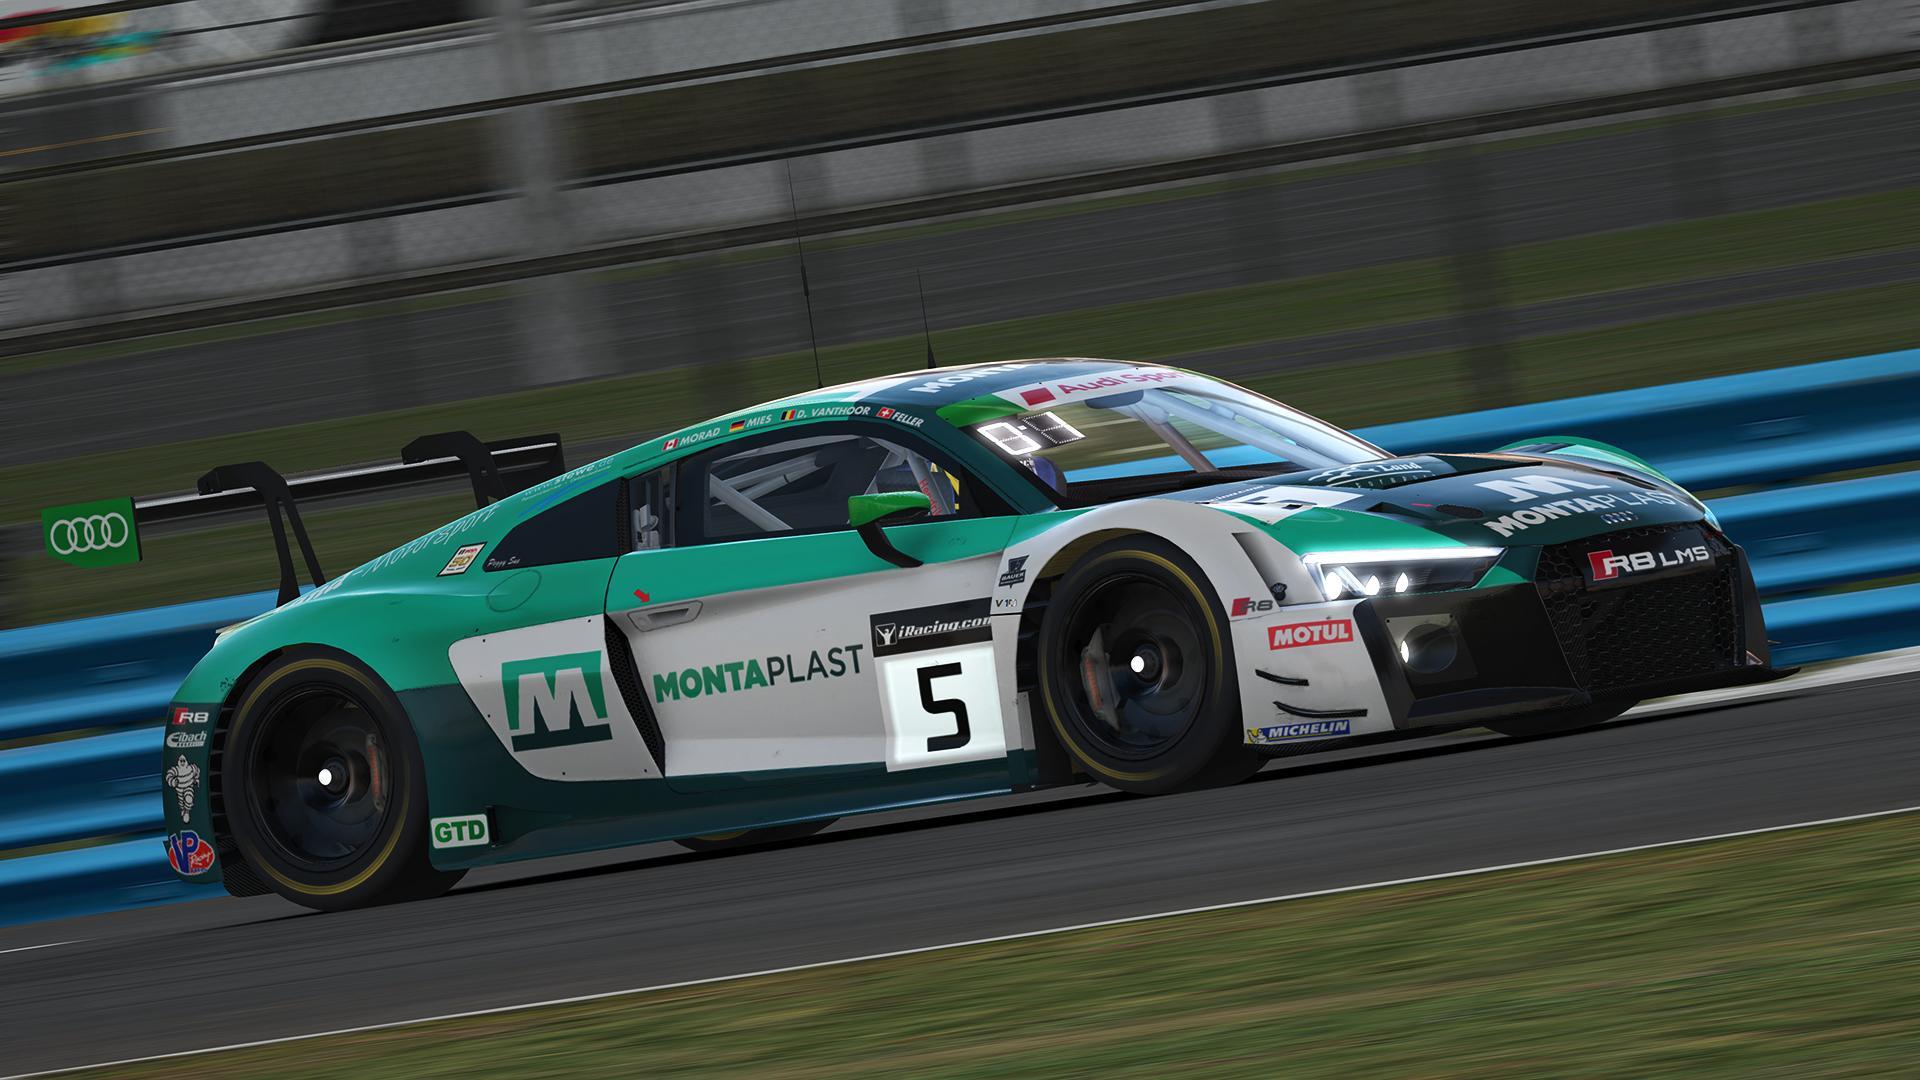 Preview of 2019 IMSA GTD - #29 Montaplast by Land Motorsport (Roar Before The 24 / Fixed for 19S2 Update) by Jann Dircks